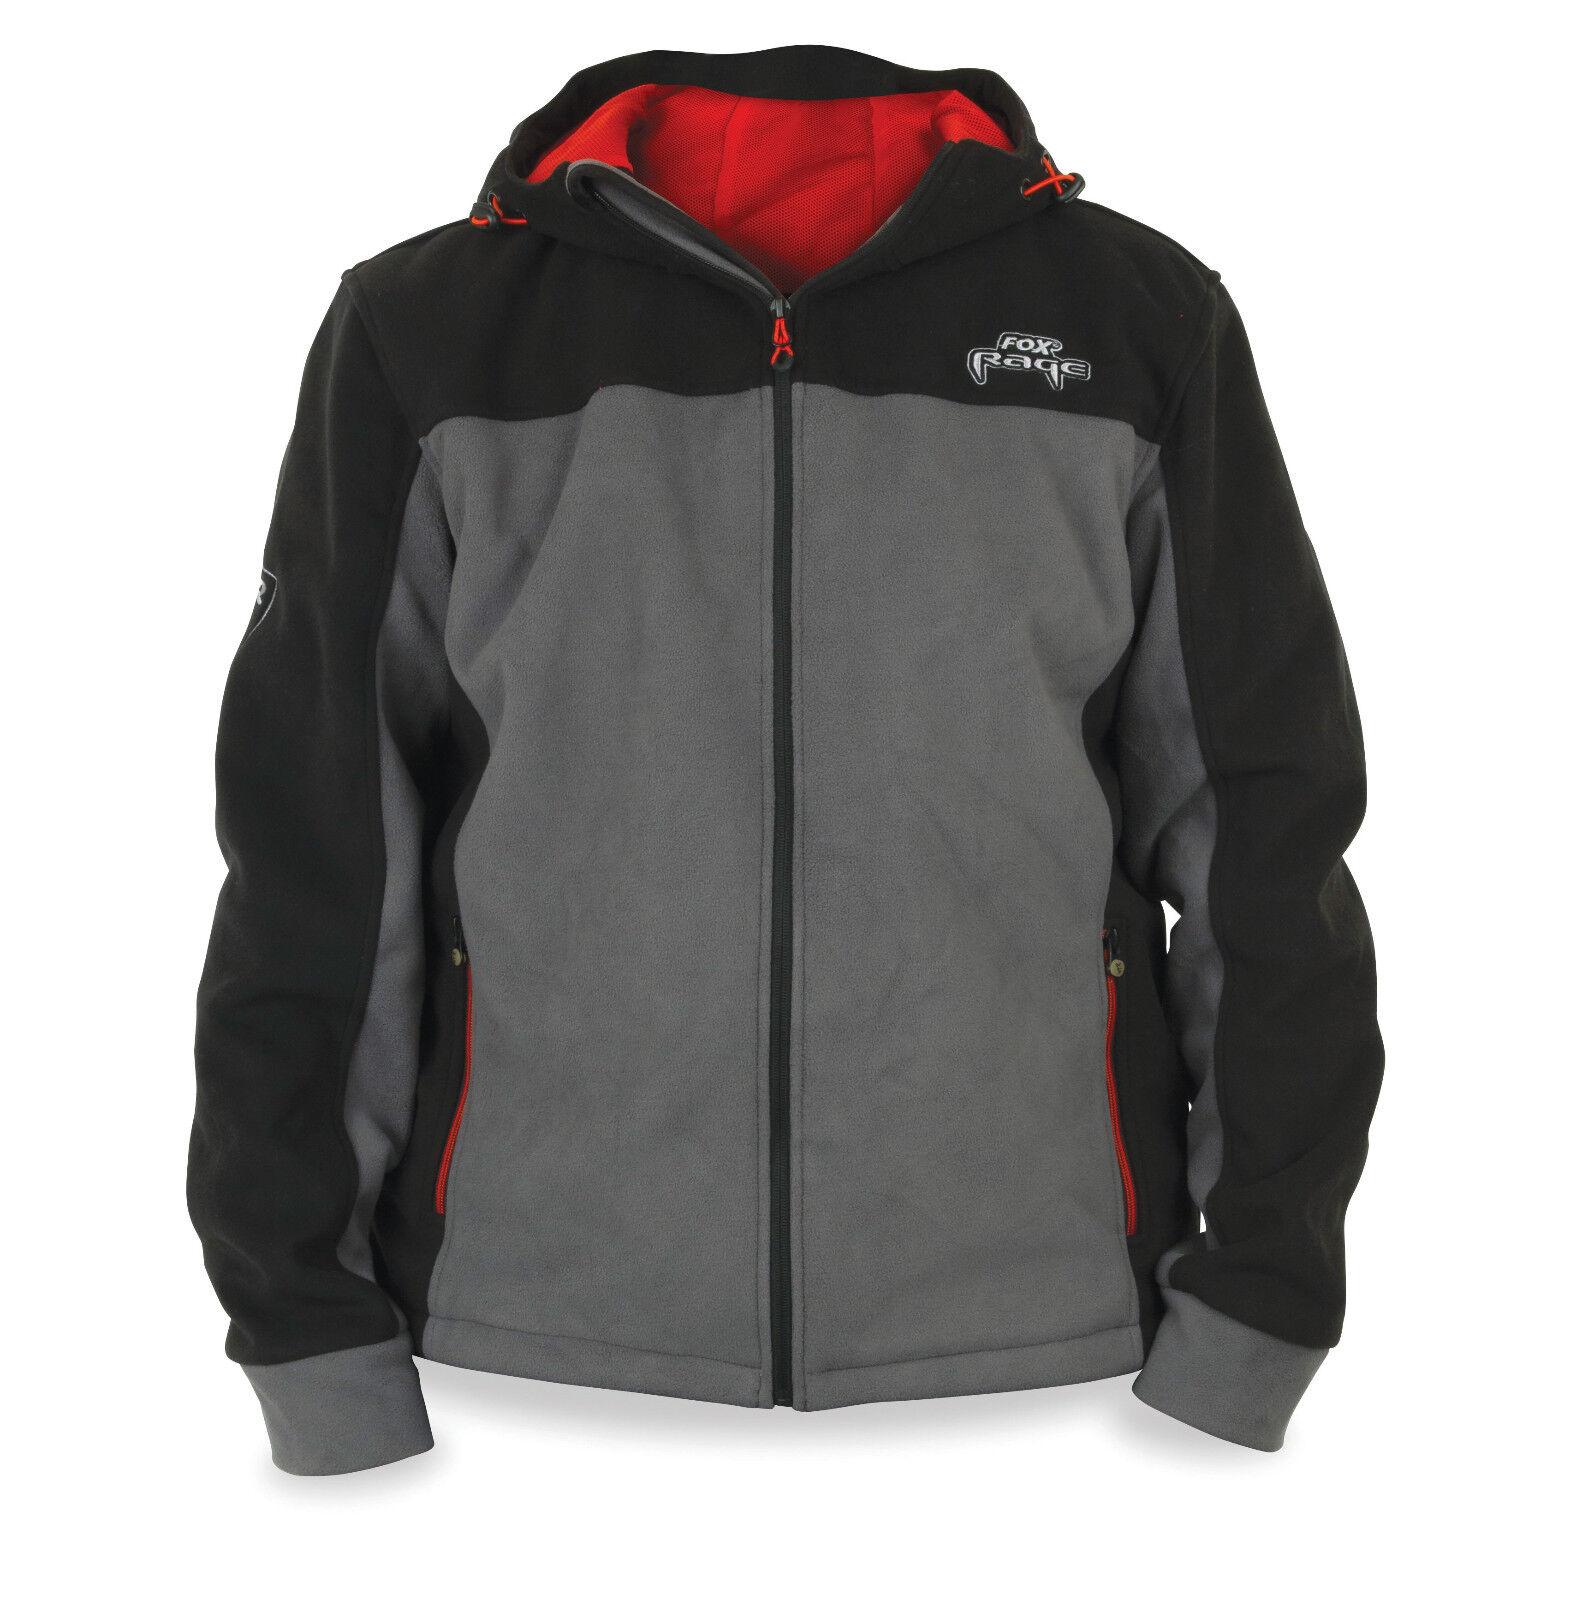 Fox Rage WIND Stopper giacca in pile caldo  WIND densa Angel Giacca Abbigliamento Angel